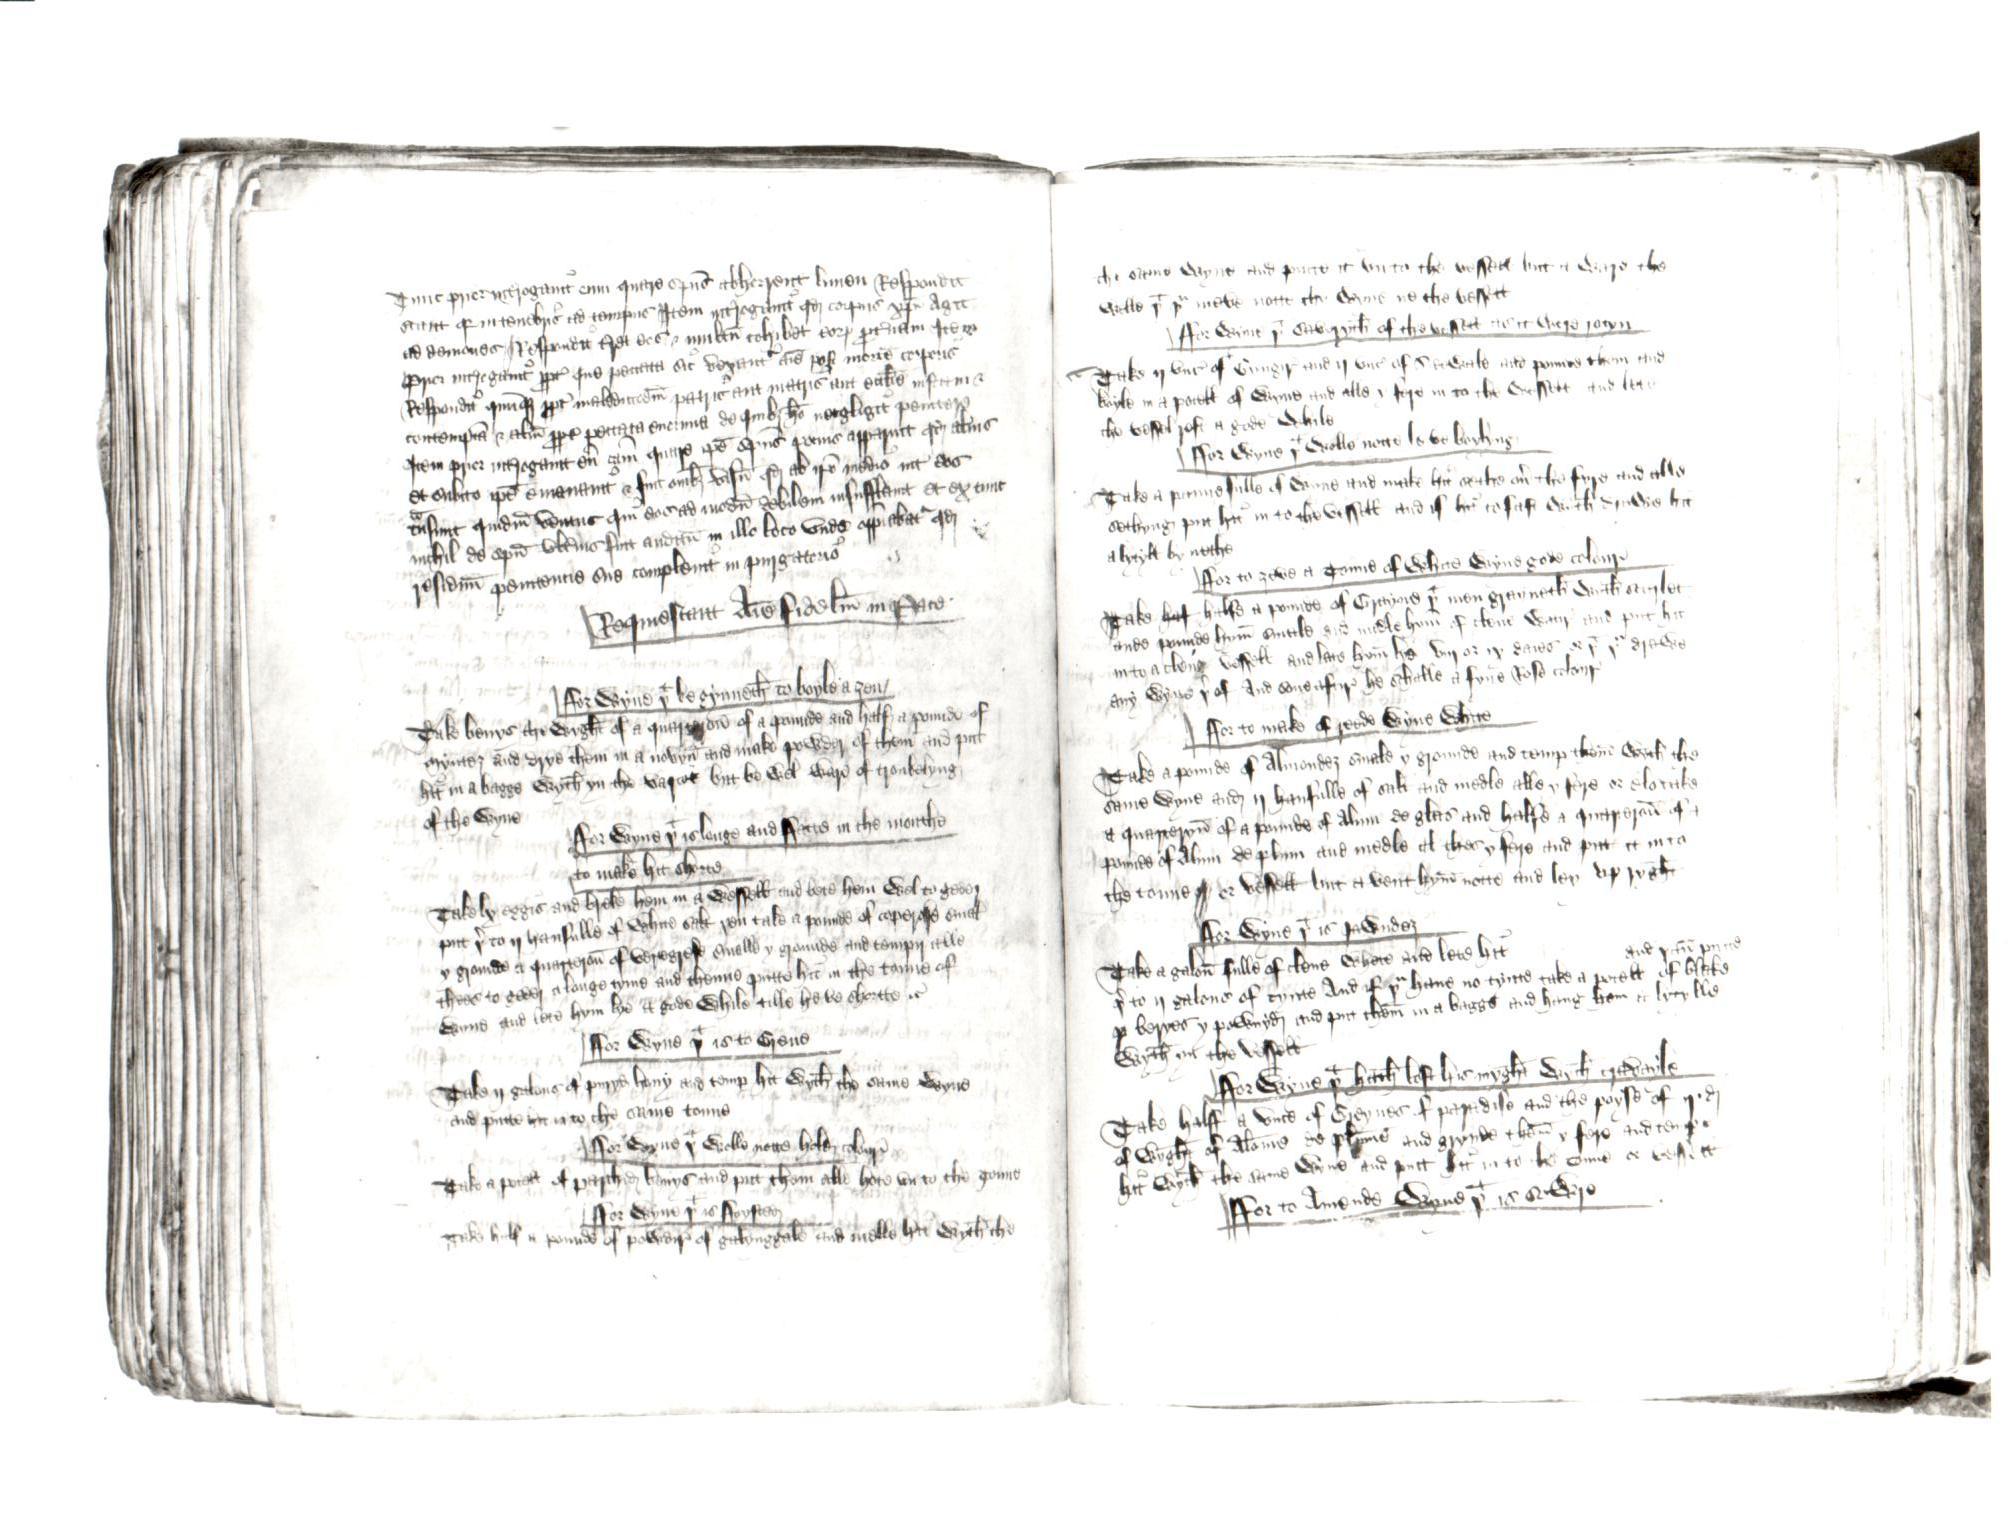 97. Beinecke MS 163, ff. 122v-123r